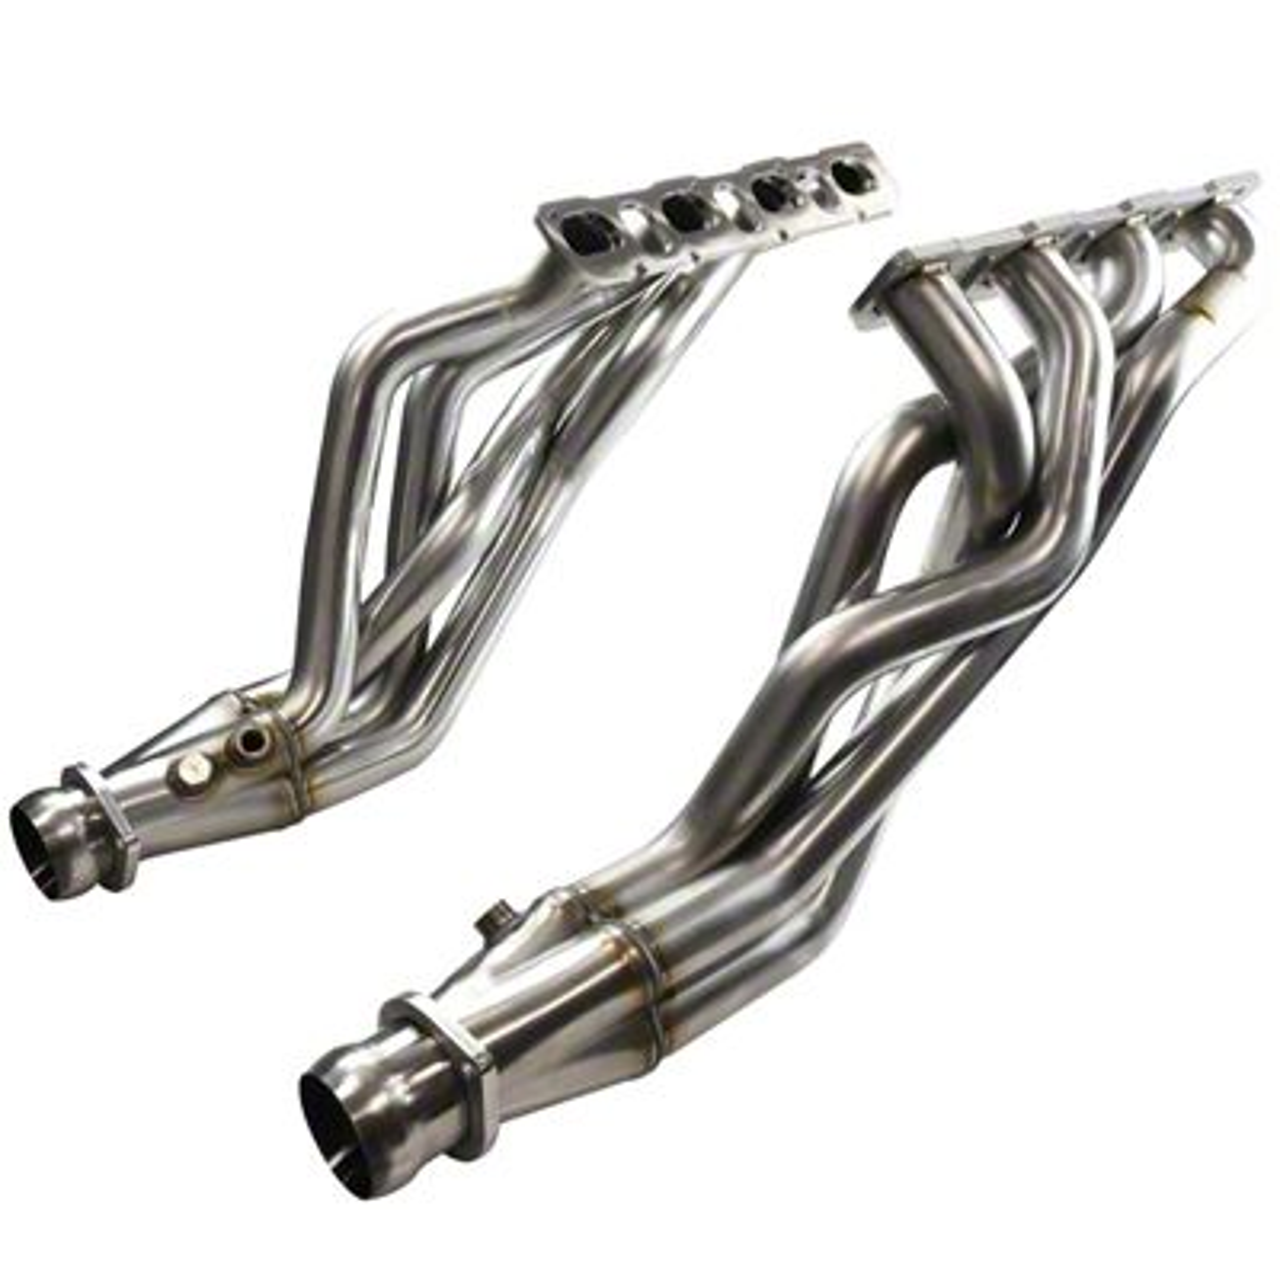 Kooks 1-7/8 in. Long Tube Headers (08-19 5.7L HEMI, 6.1L HEMI, 6.4L HEMI)